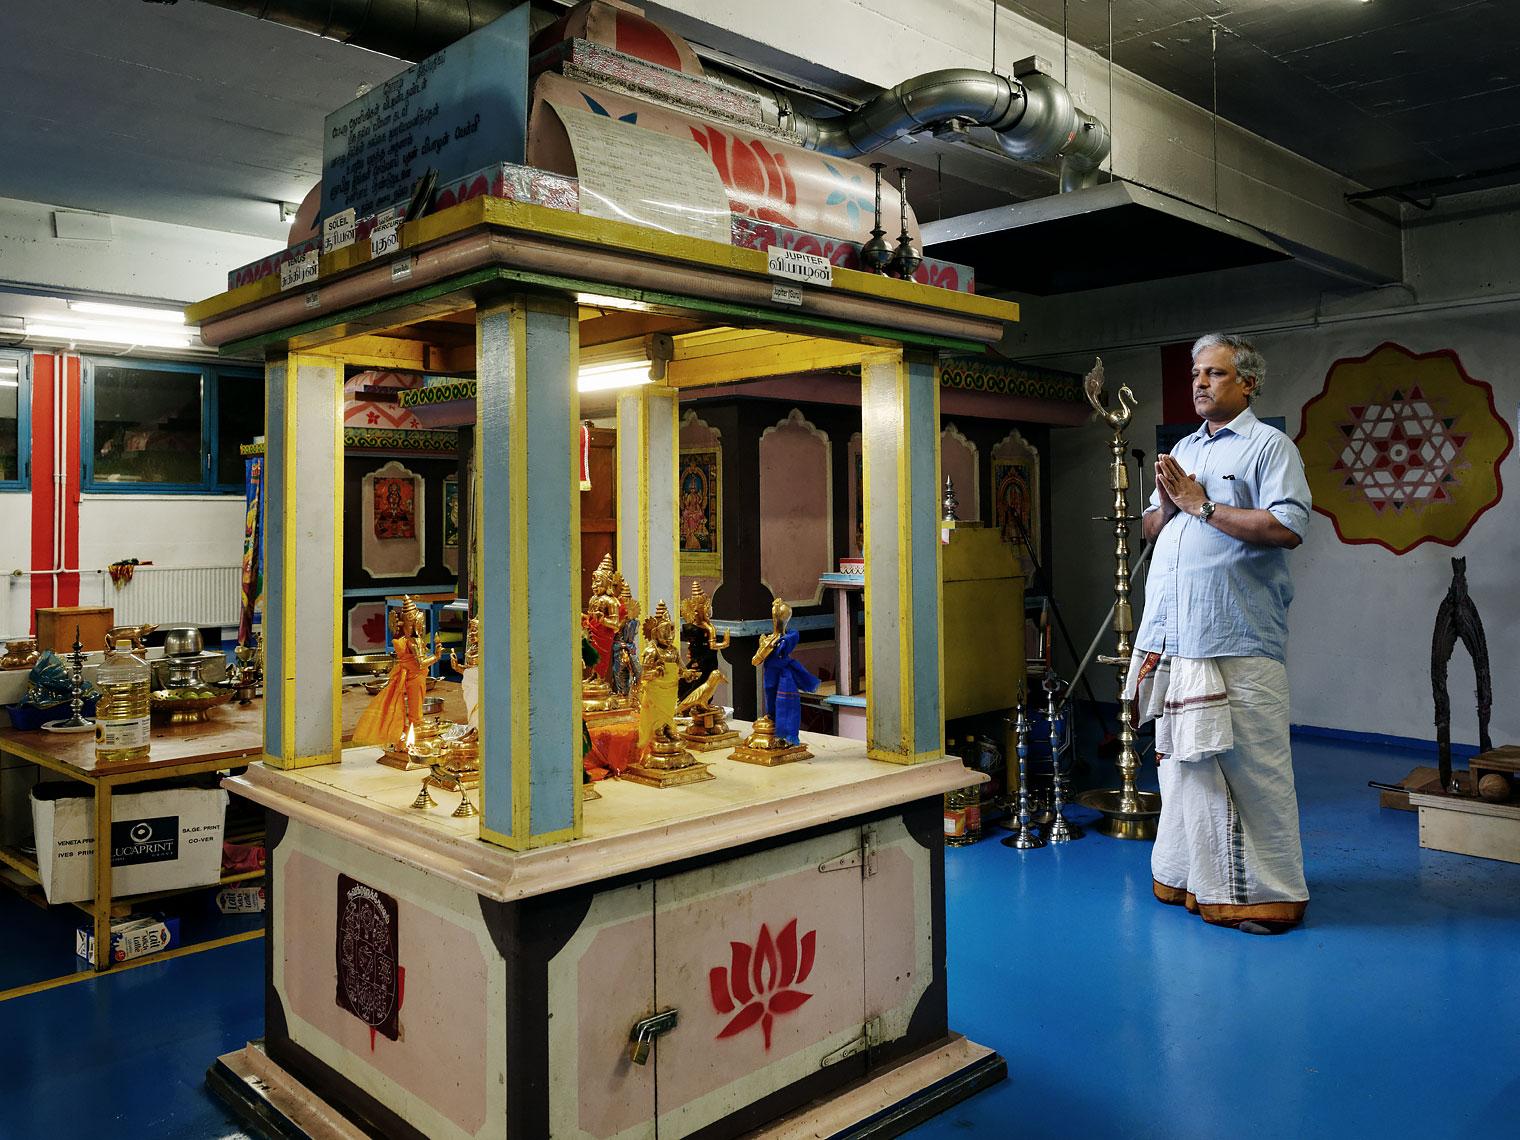 Baskaralingam Veerakathy prie dans le temple hindouiste de Prilly.